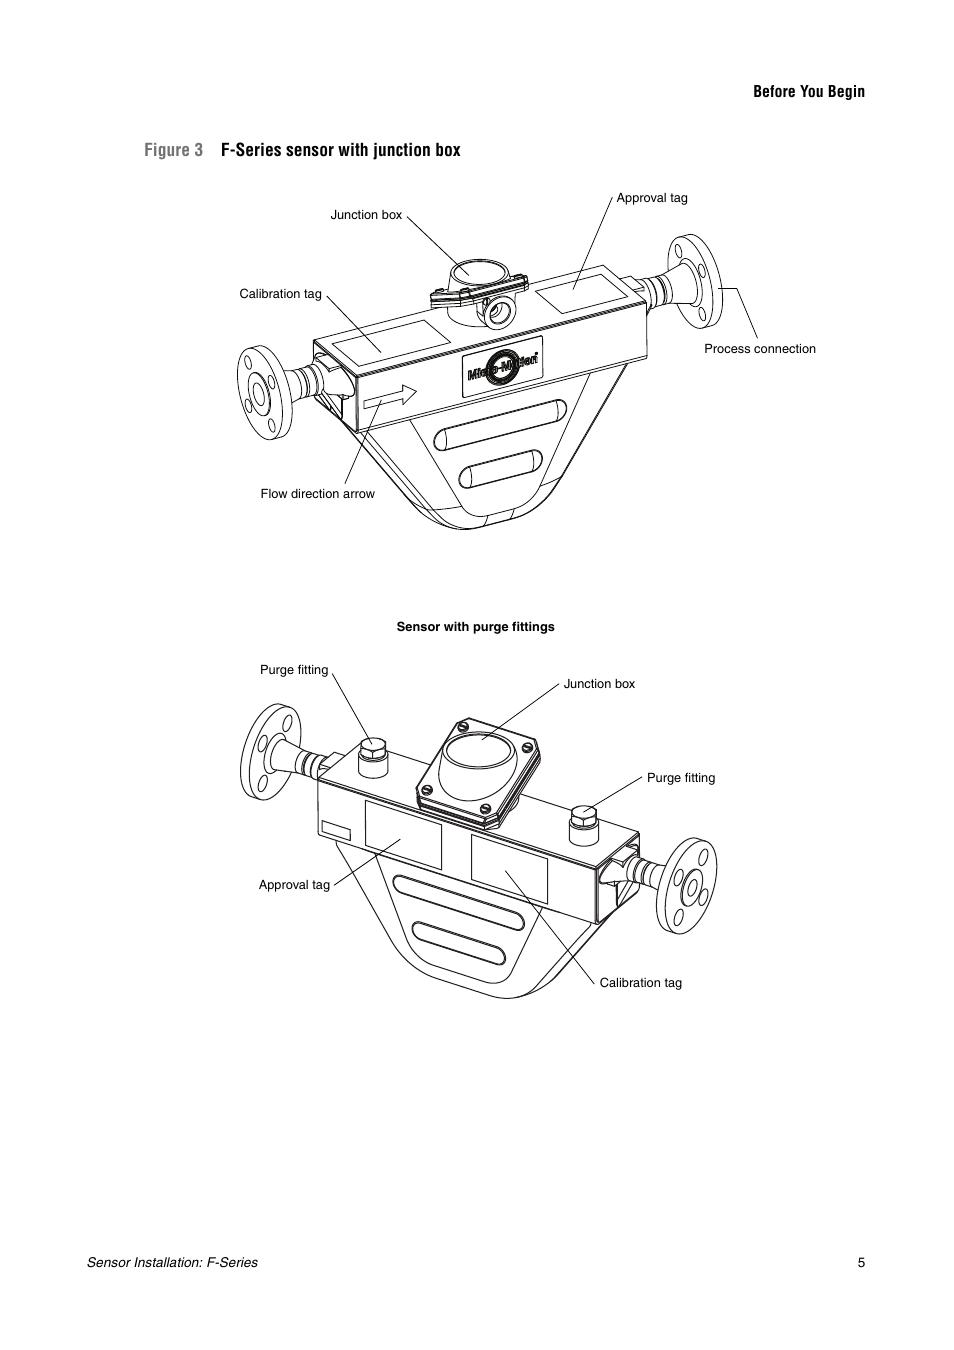 Processor (figure 3, Figure 3 f-series sensor with